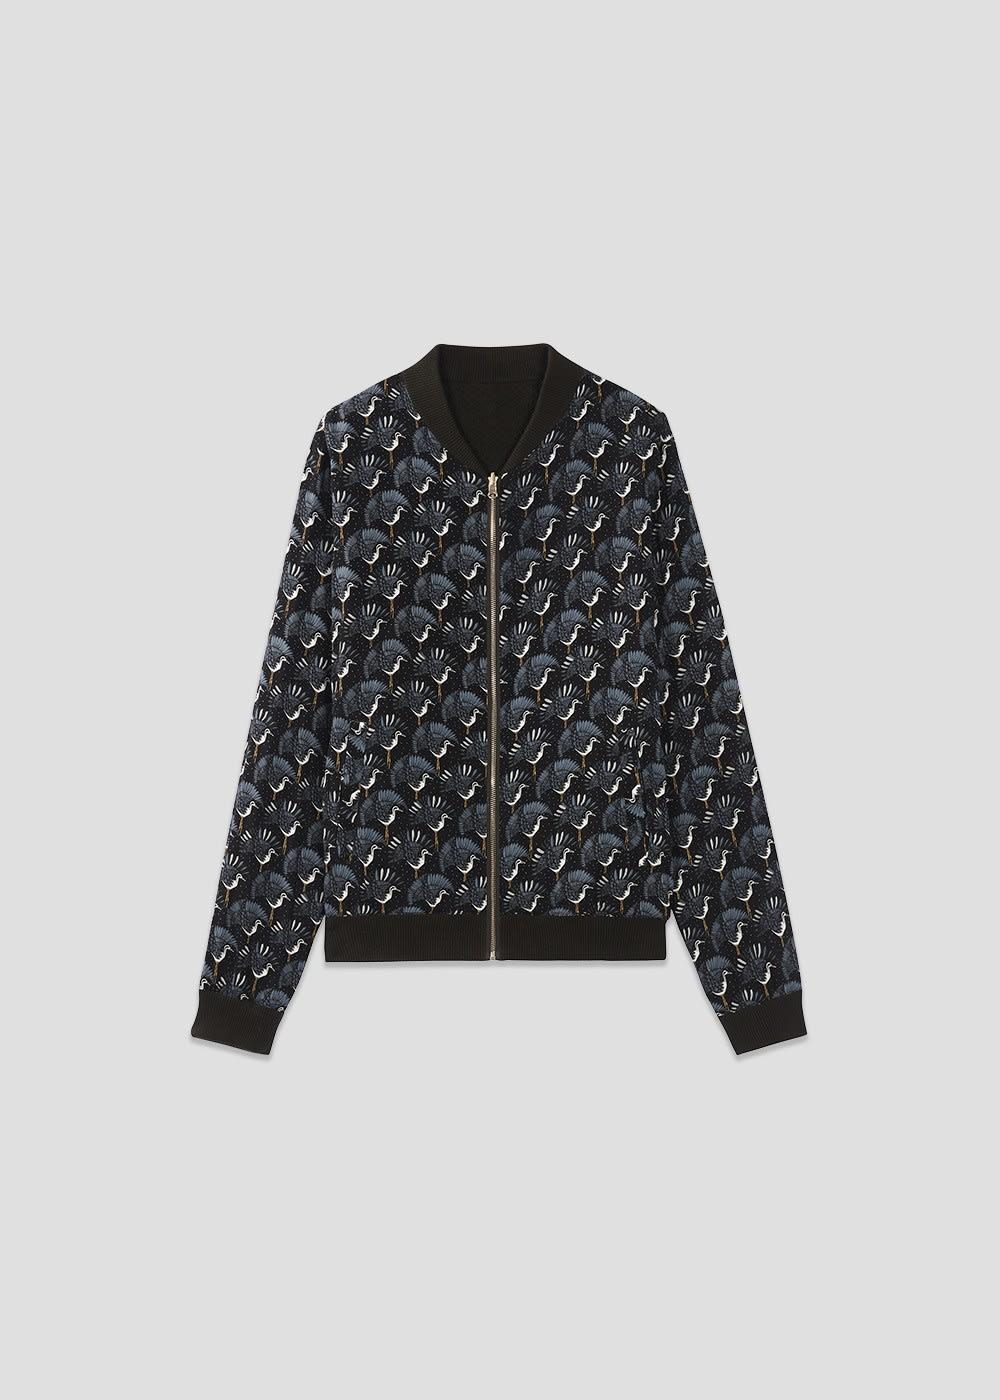 MARIE SIXTINE Zoe Heron Print Reversible Jacket